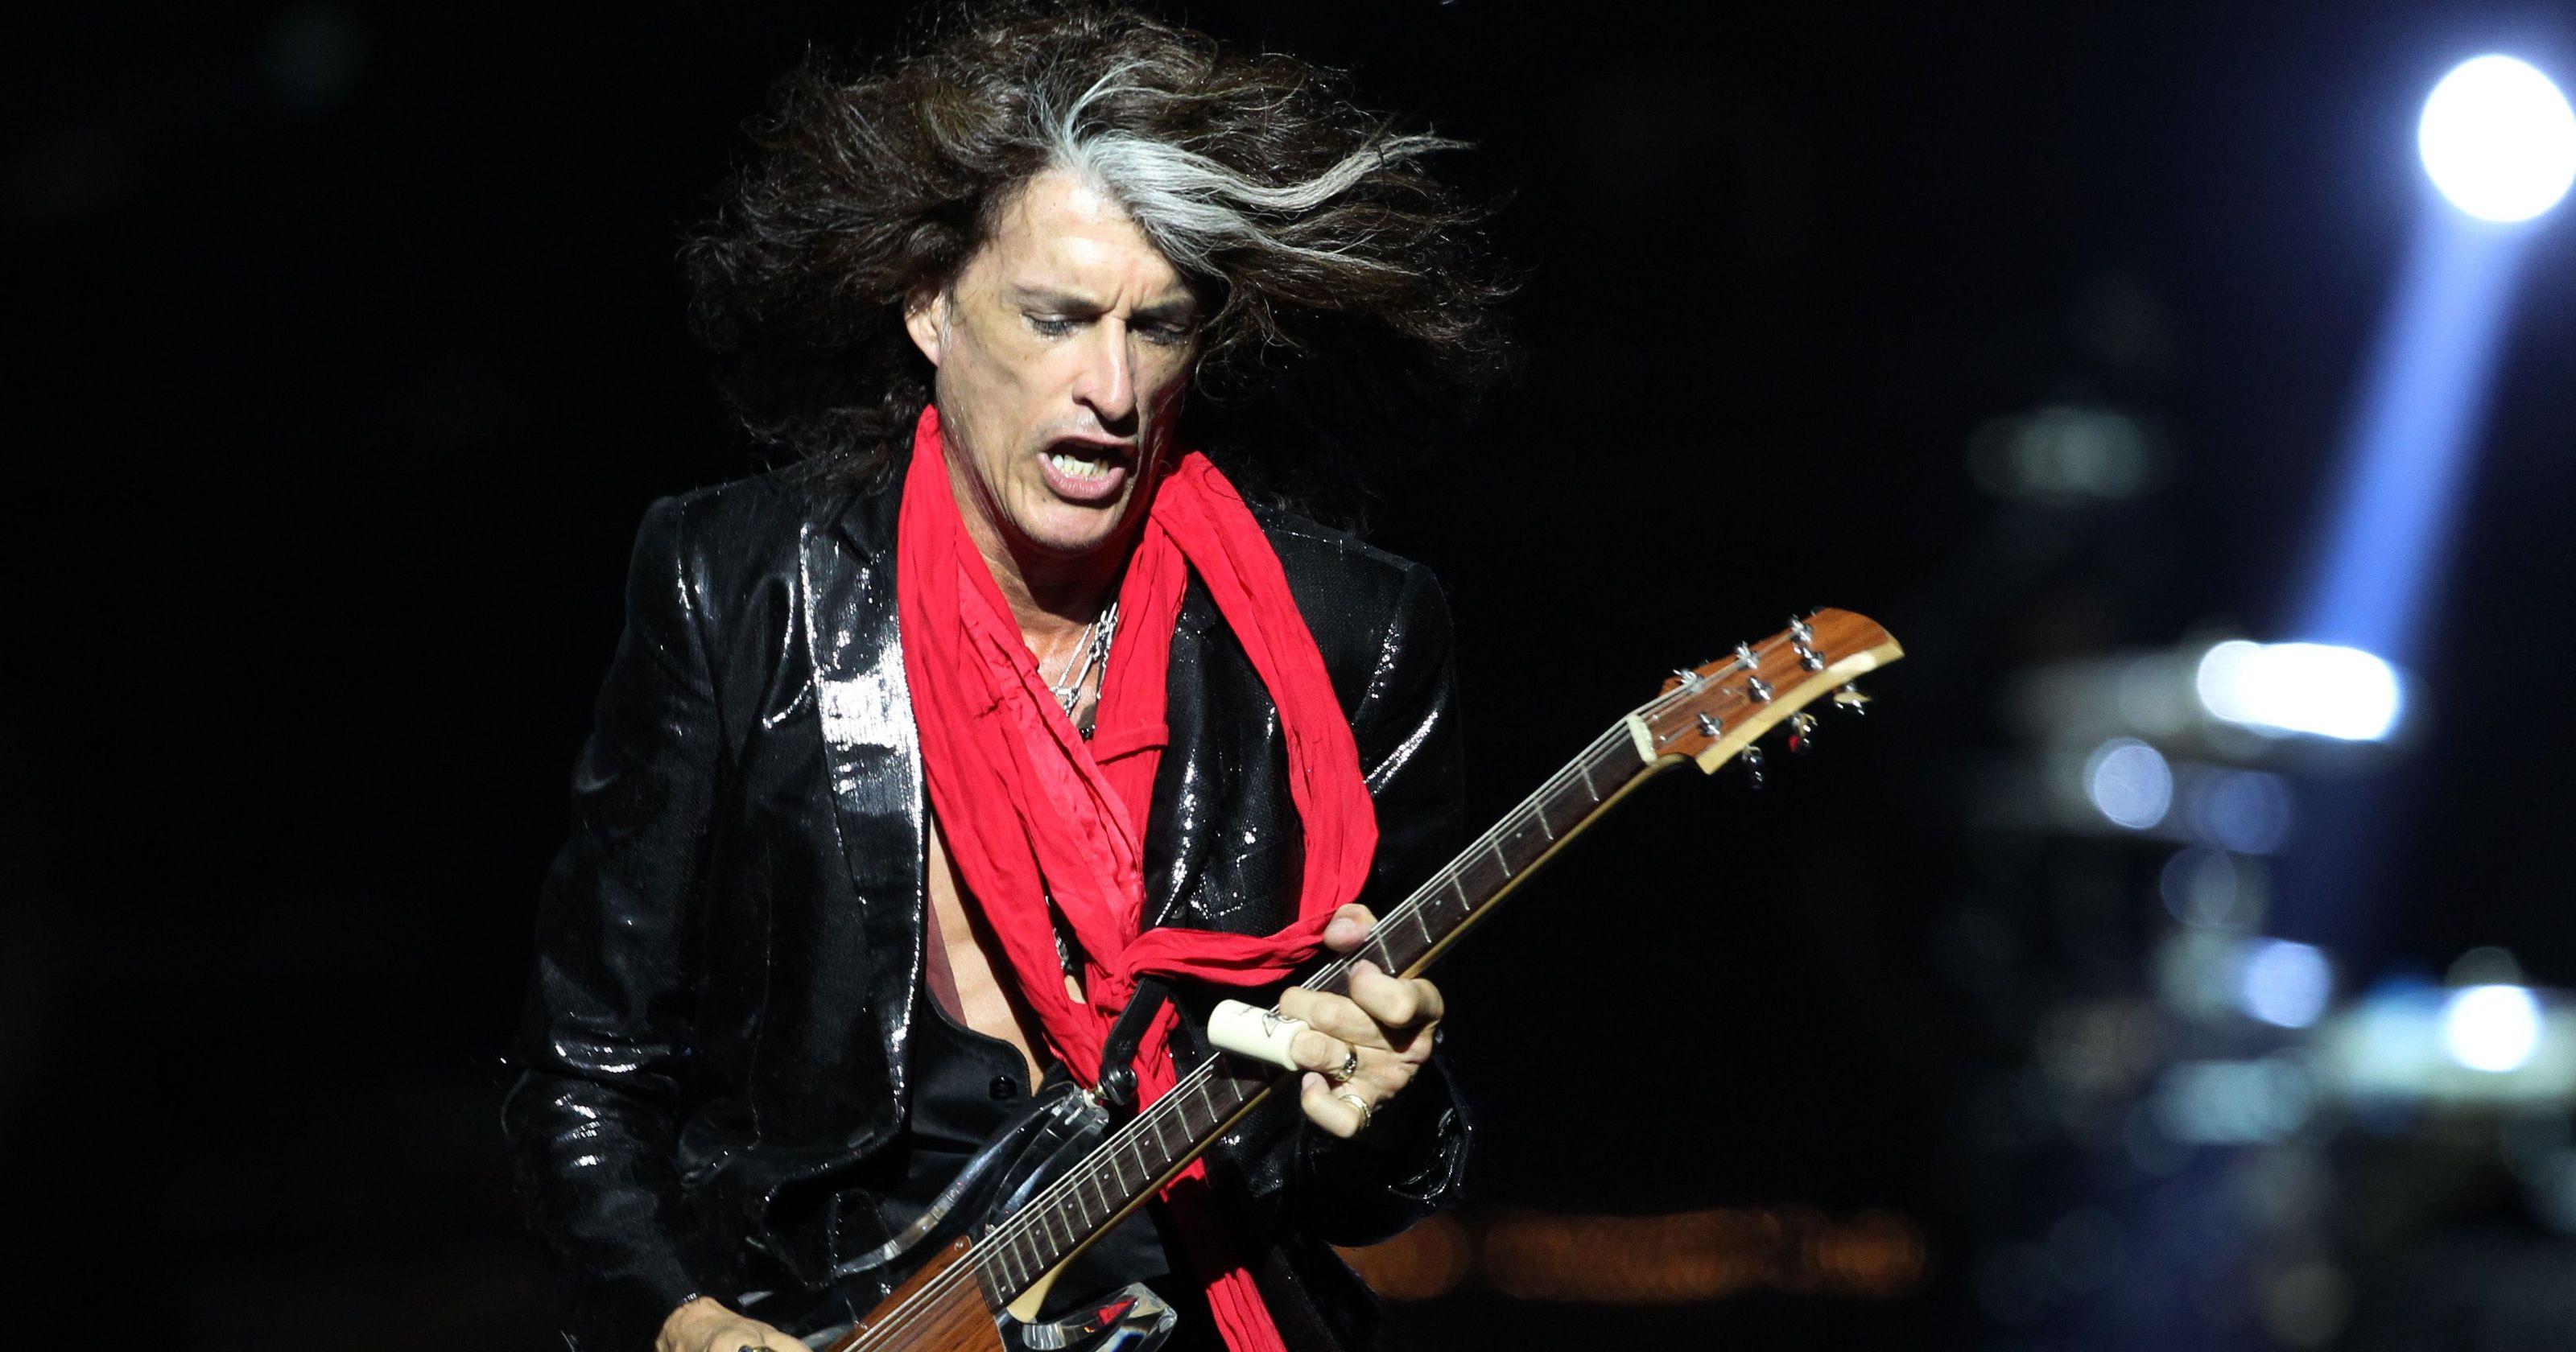 Hospitalizan al guitarrista de Aerosmith Joe Perry